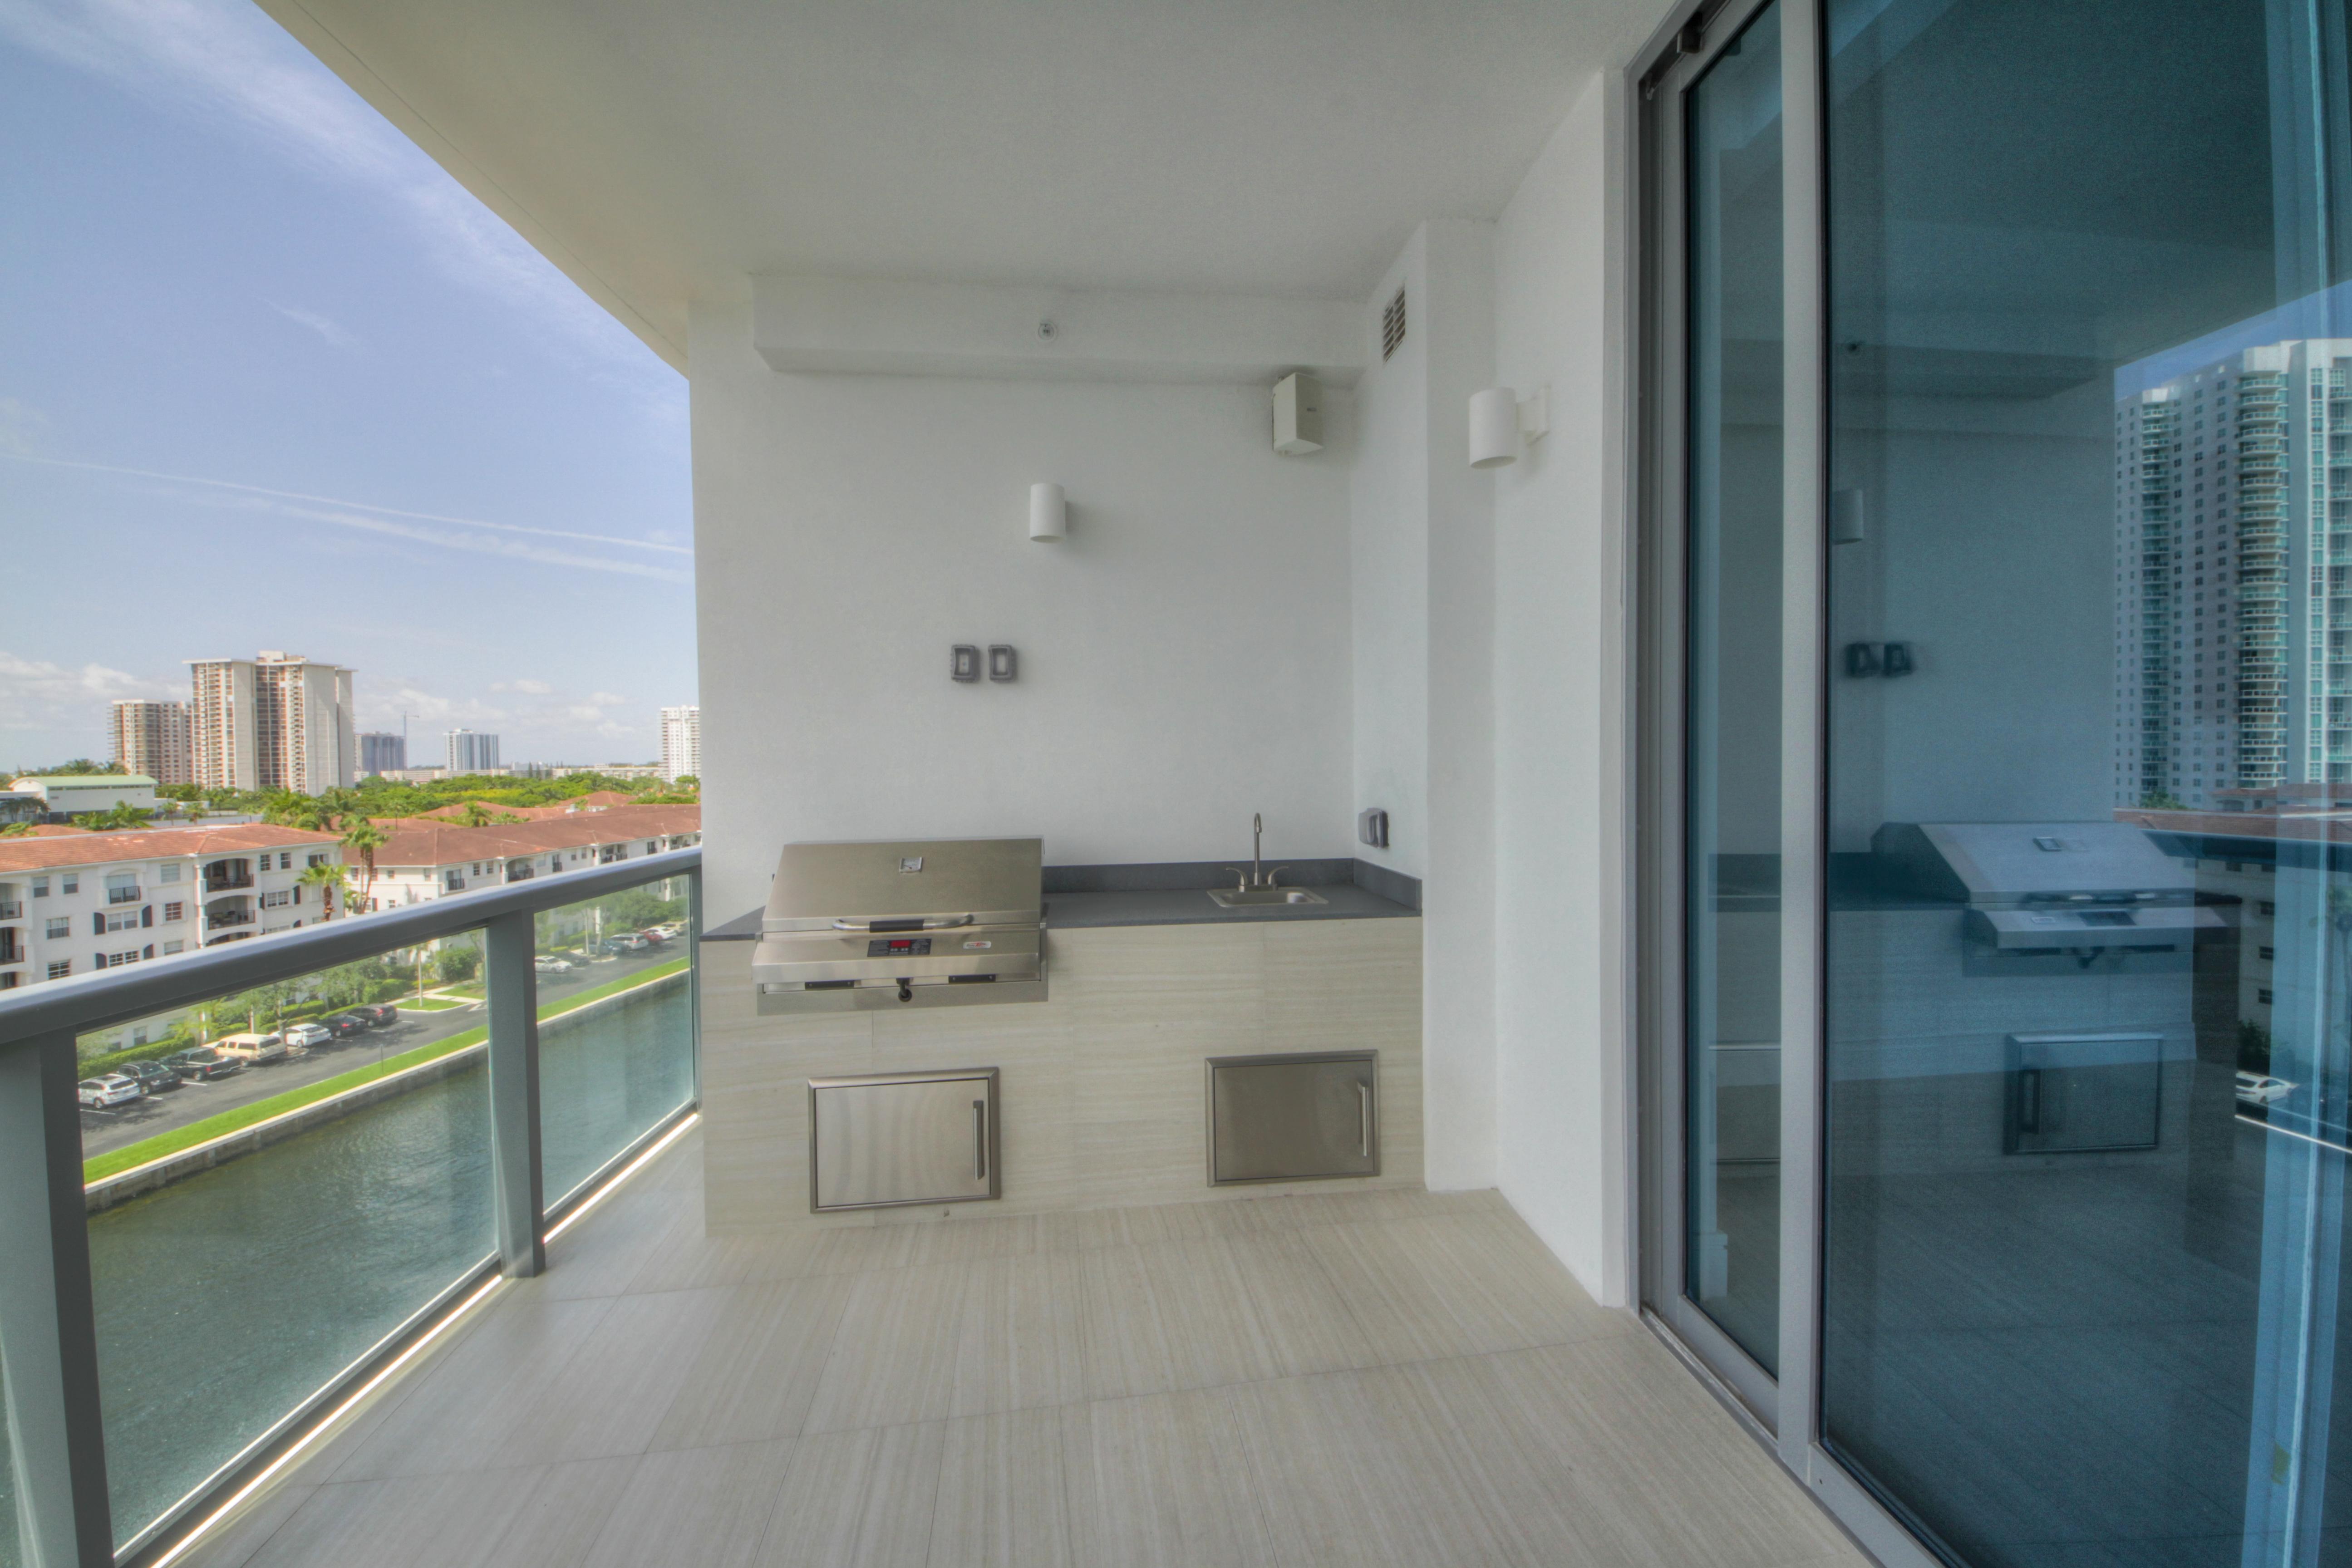 Apartment for Sale at 3300 Ne 188th St #612 3300 Ne 188th St 612 Miami, Florida, 33180 United States